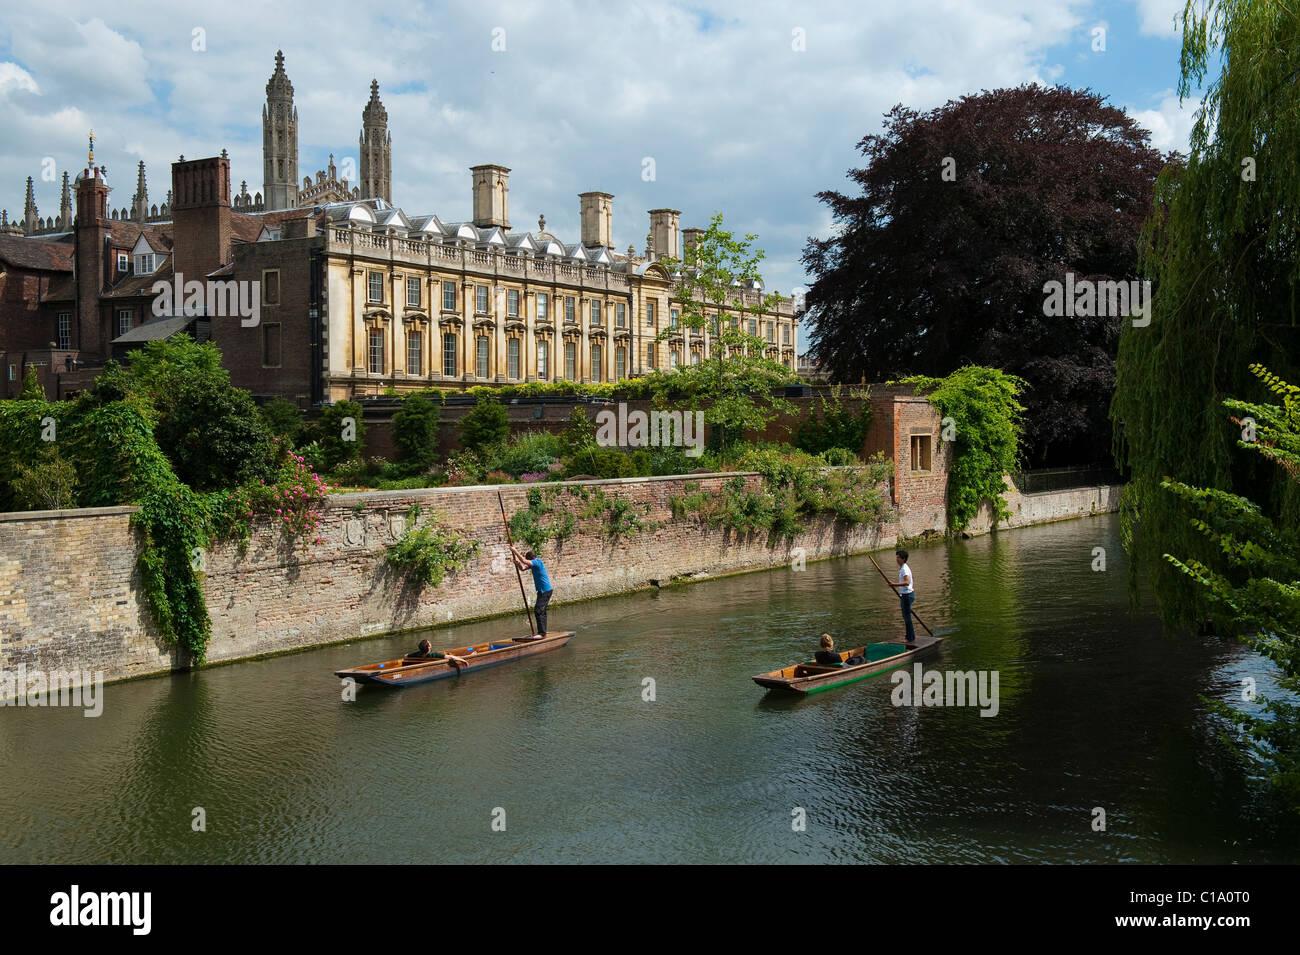 Tourists punting on The Backs, Cambridge - Stock Image